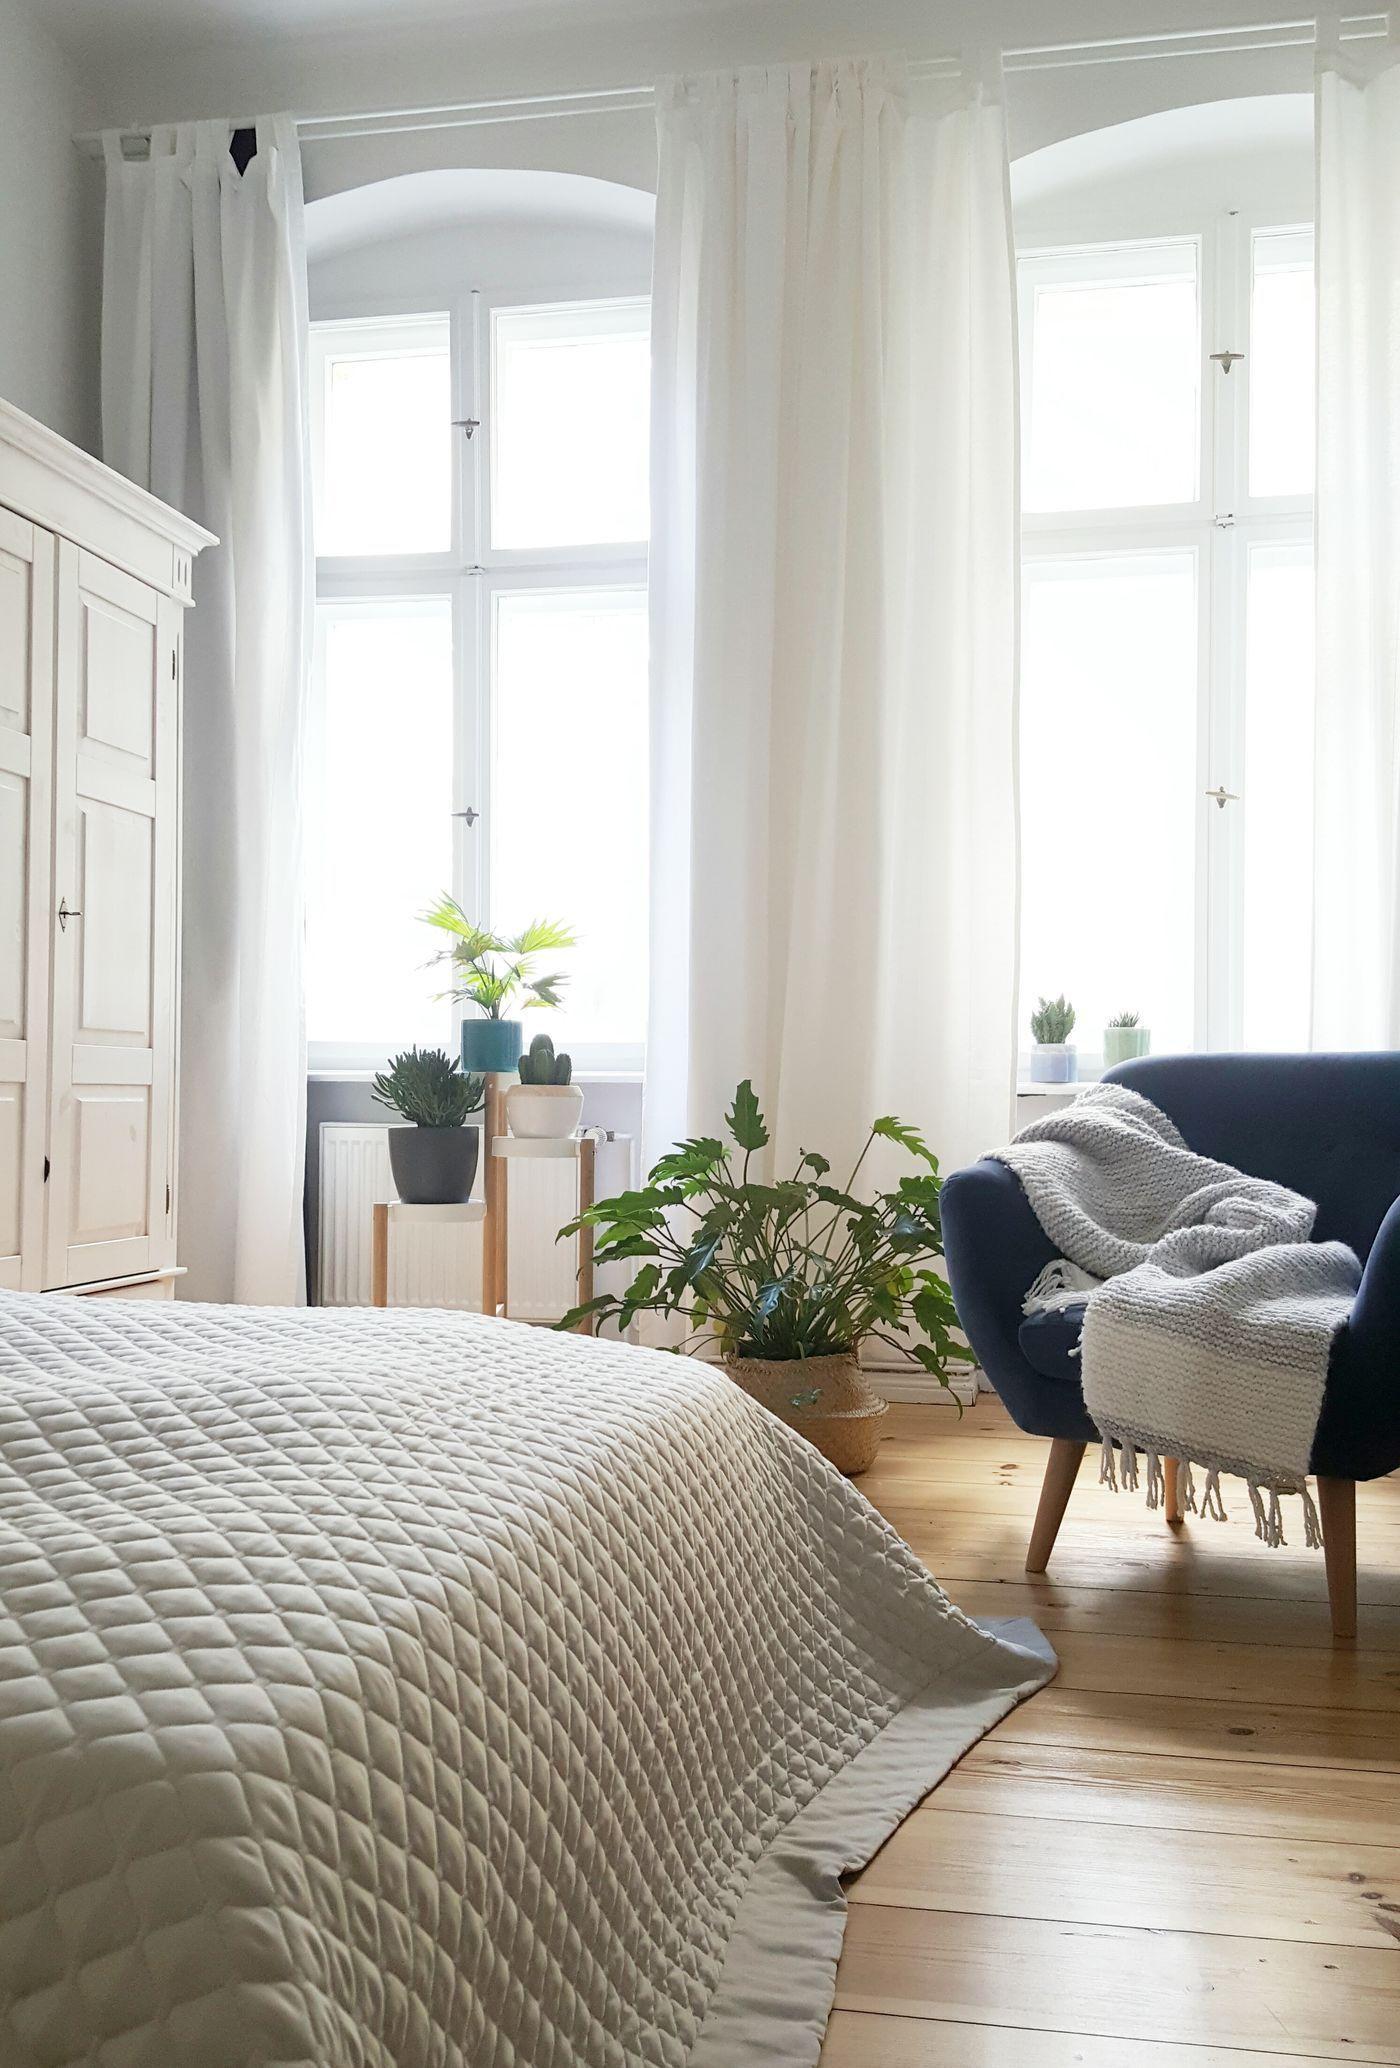 Skandinavische Schlafzimmer Skandinavisches Schlafzimmer Schlafzimmer Ideen Wohnen